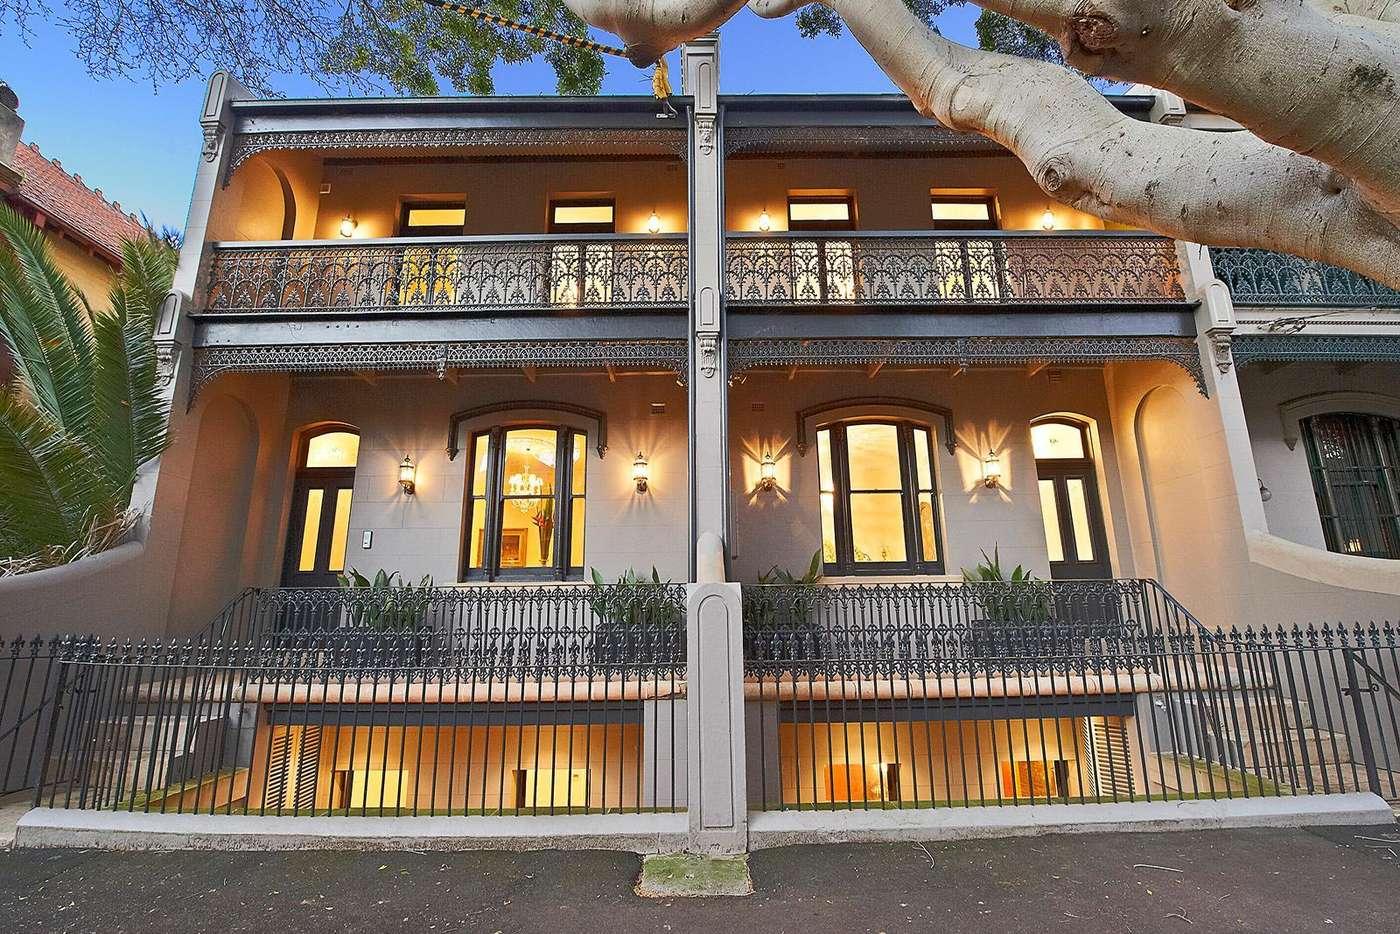 Main view of Homely house listing, 124-126 Paddington Street, Paddington NSW 2021